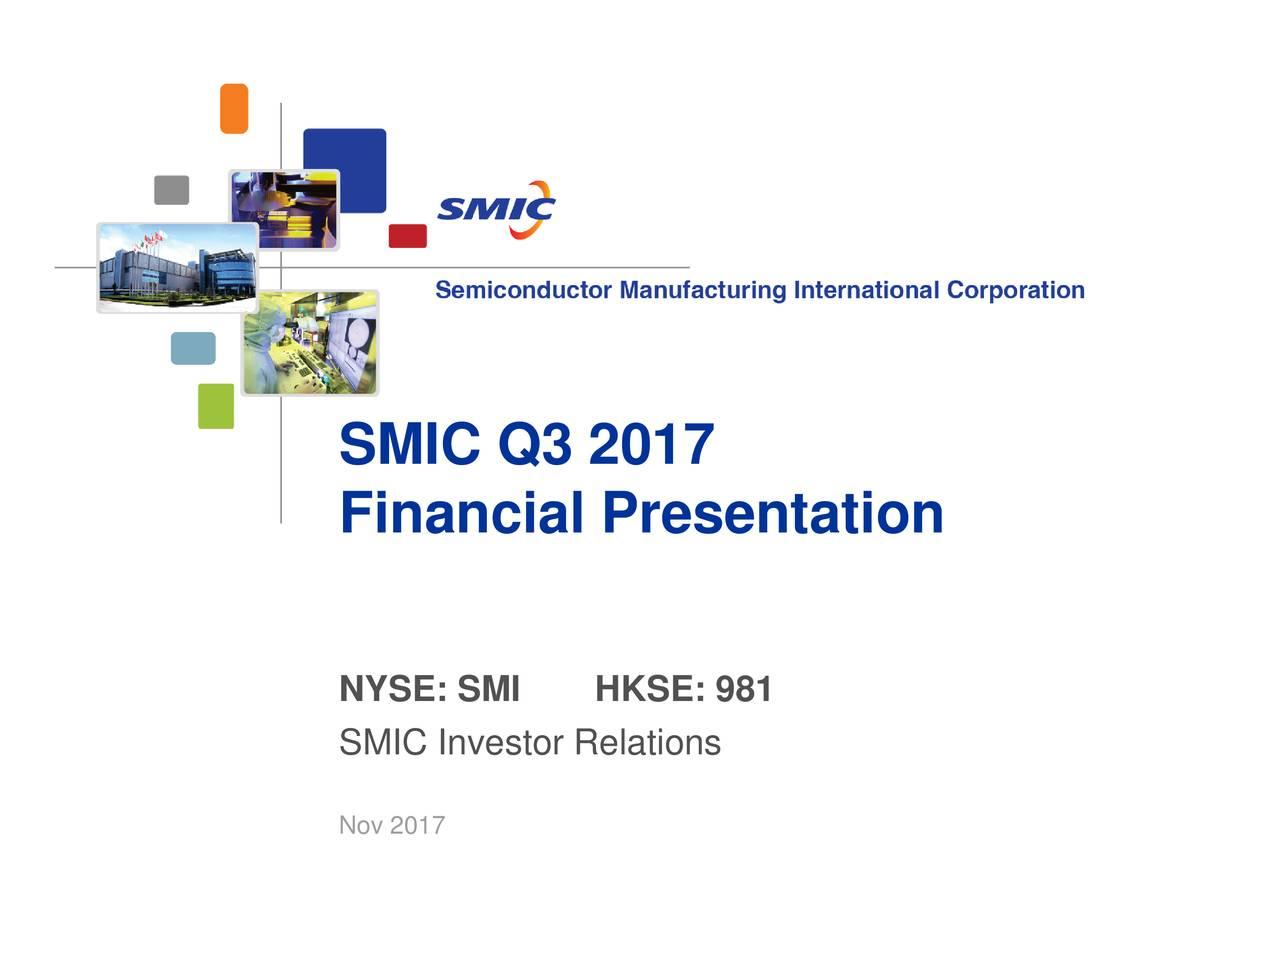 Financial Presentation NYSE: SMI HKSE: 981 SMIC Investor Relations Nov 2017